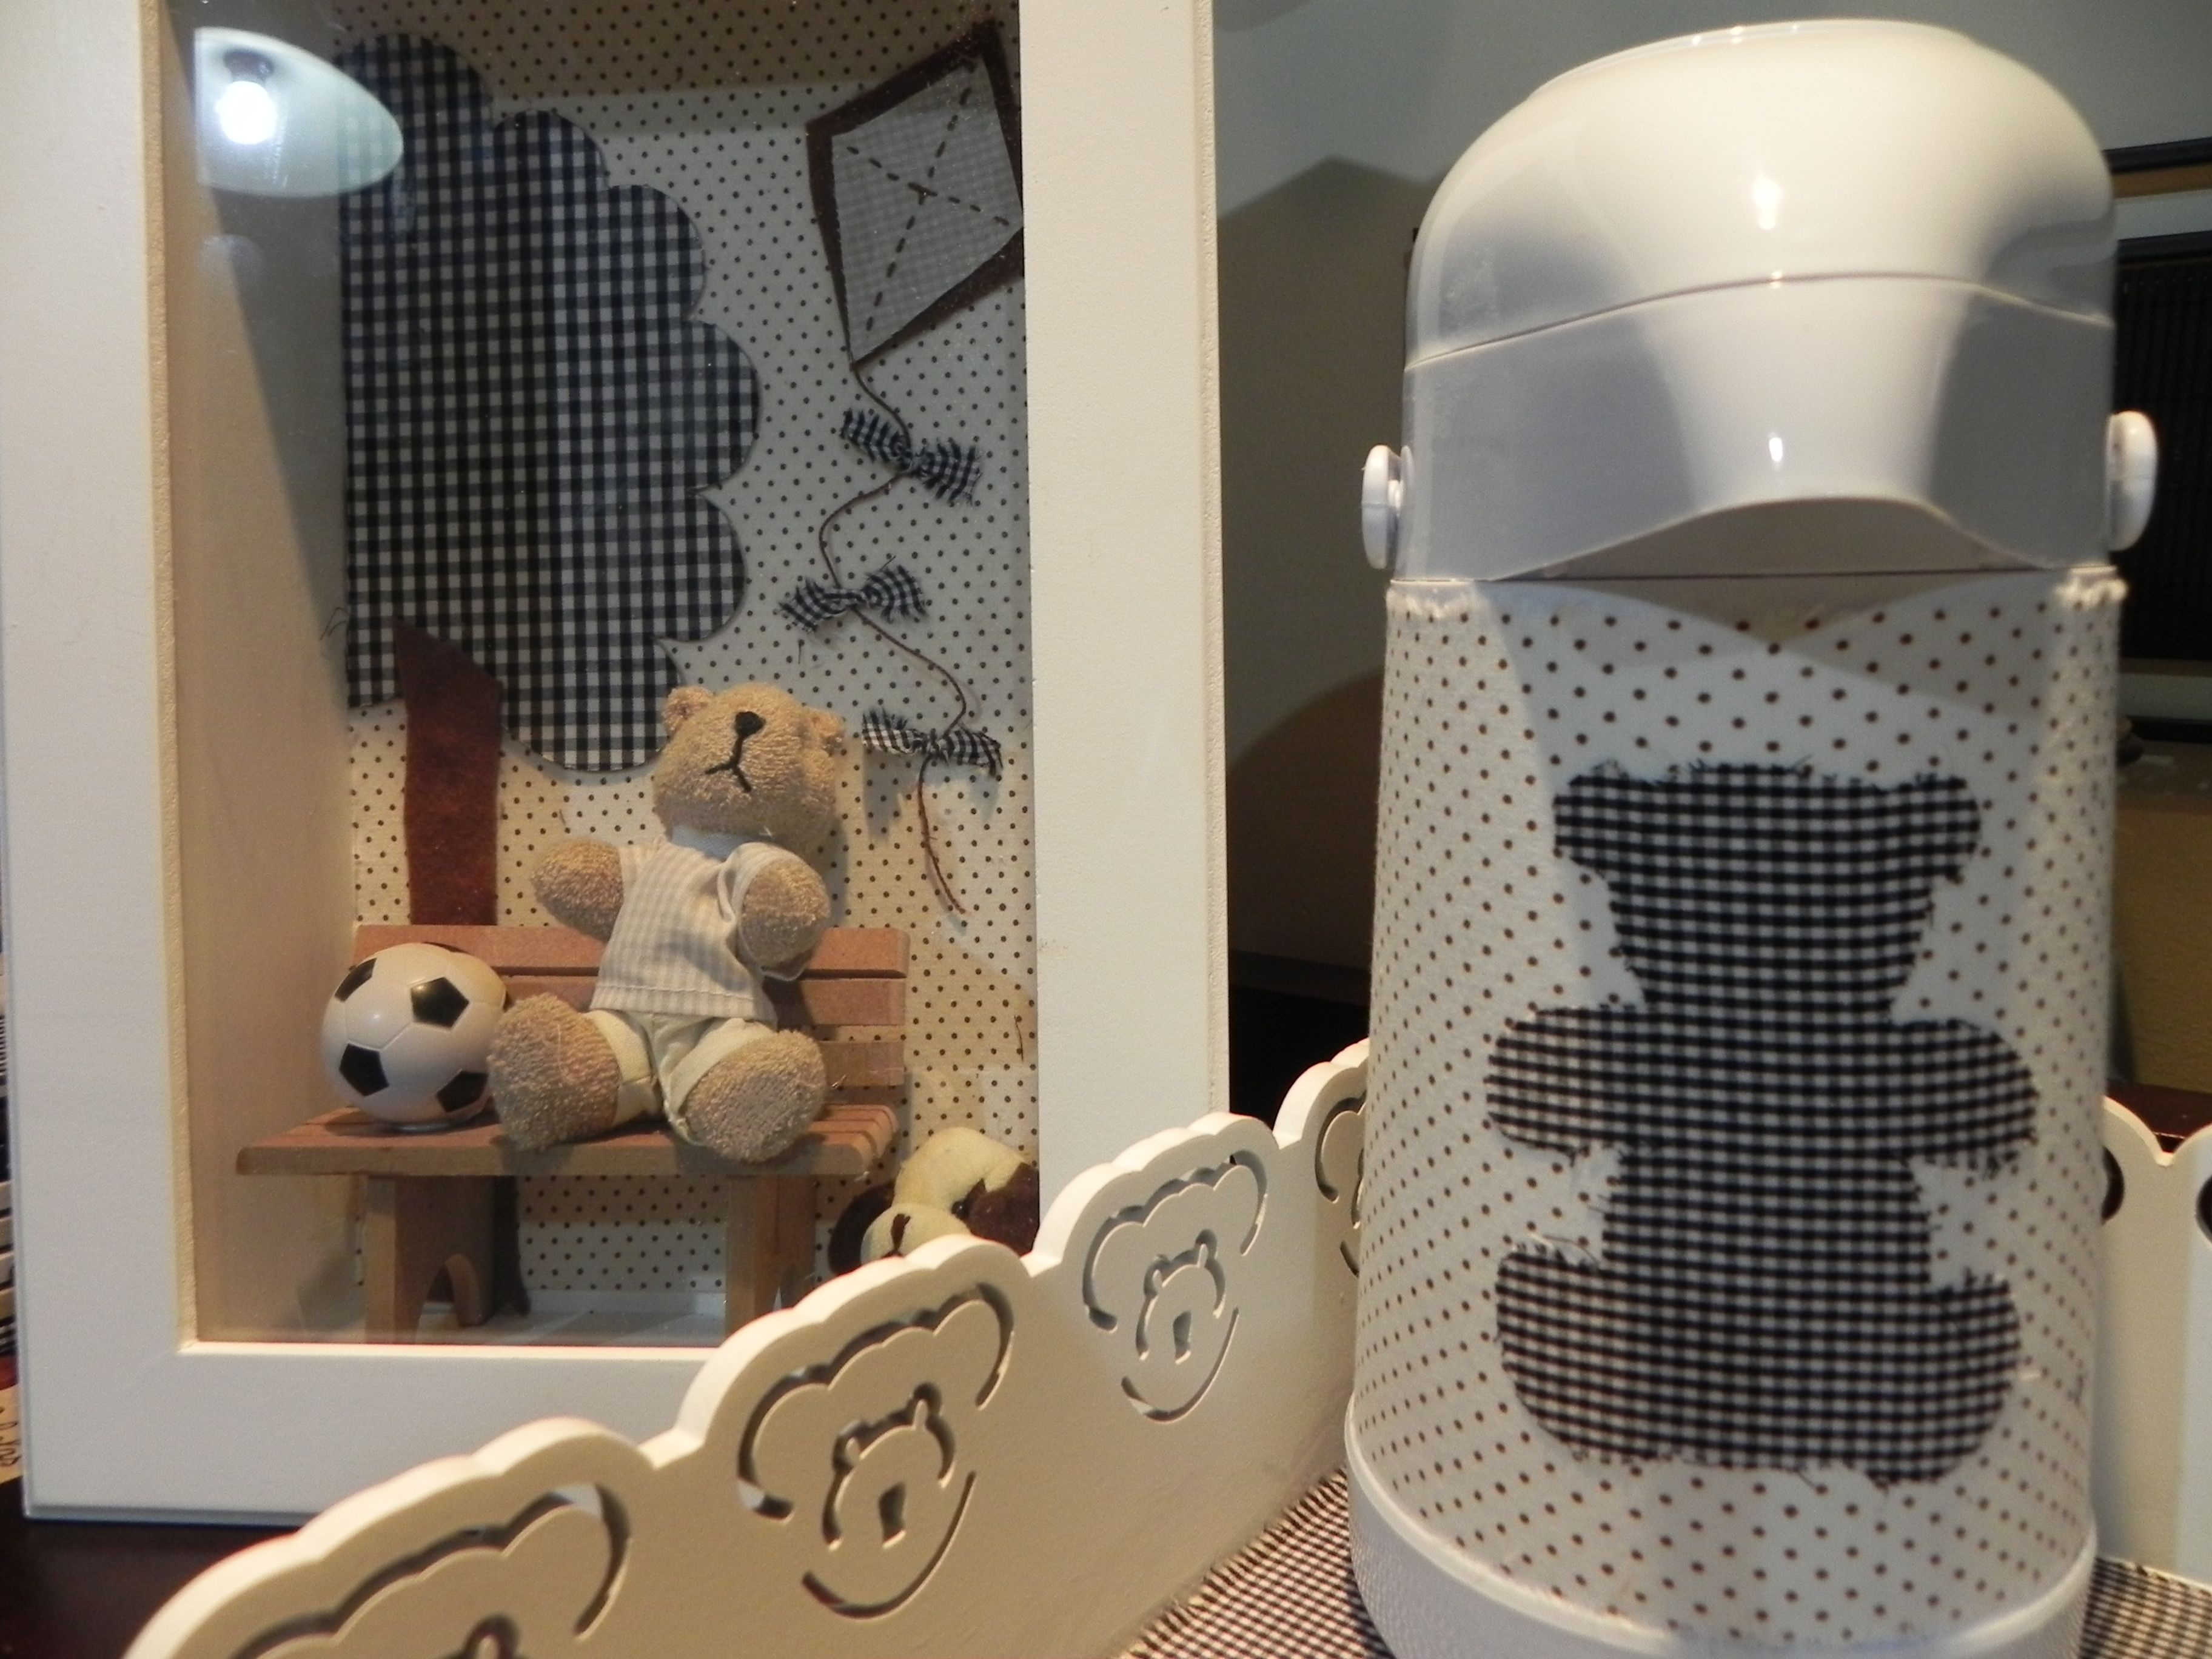 Quadro maternidade, cesta e garrafa térmica